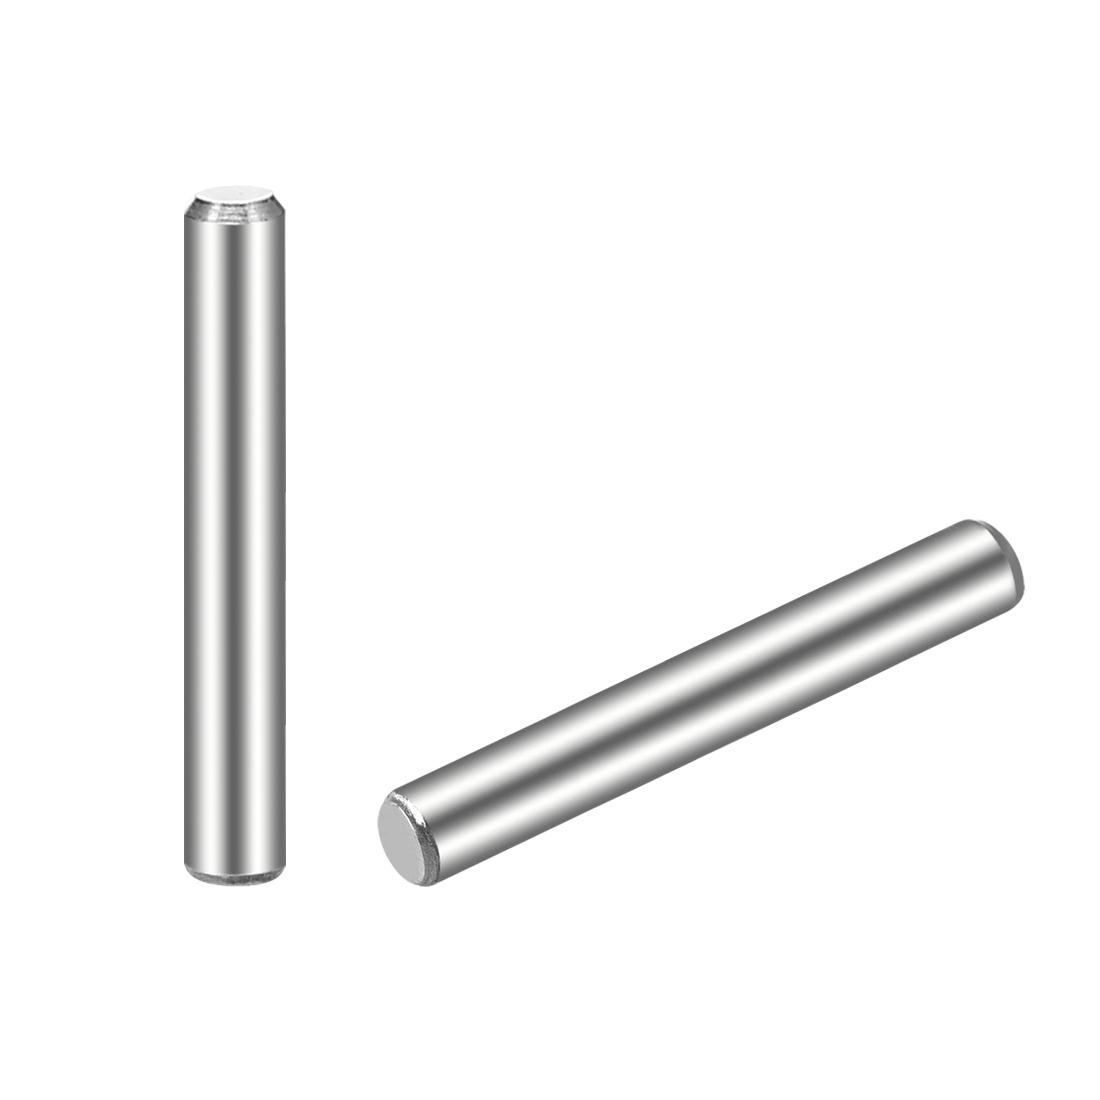 50Pcs 3mm x 20mm Dowel Pin 304 Stainless Steel Shelf Support Pin Fasten